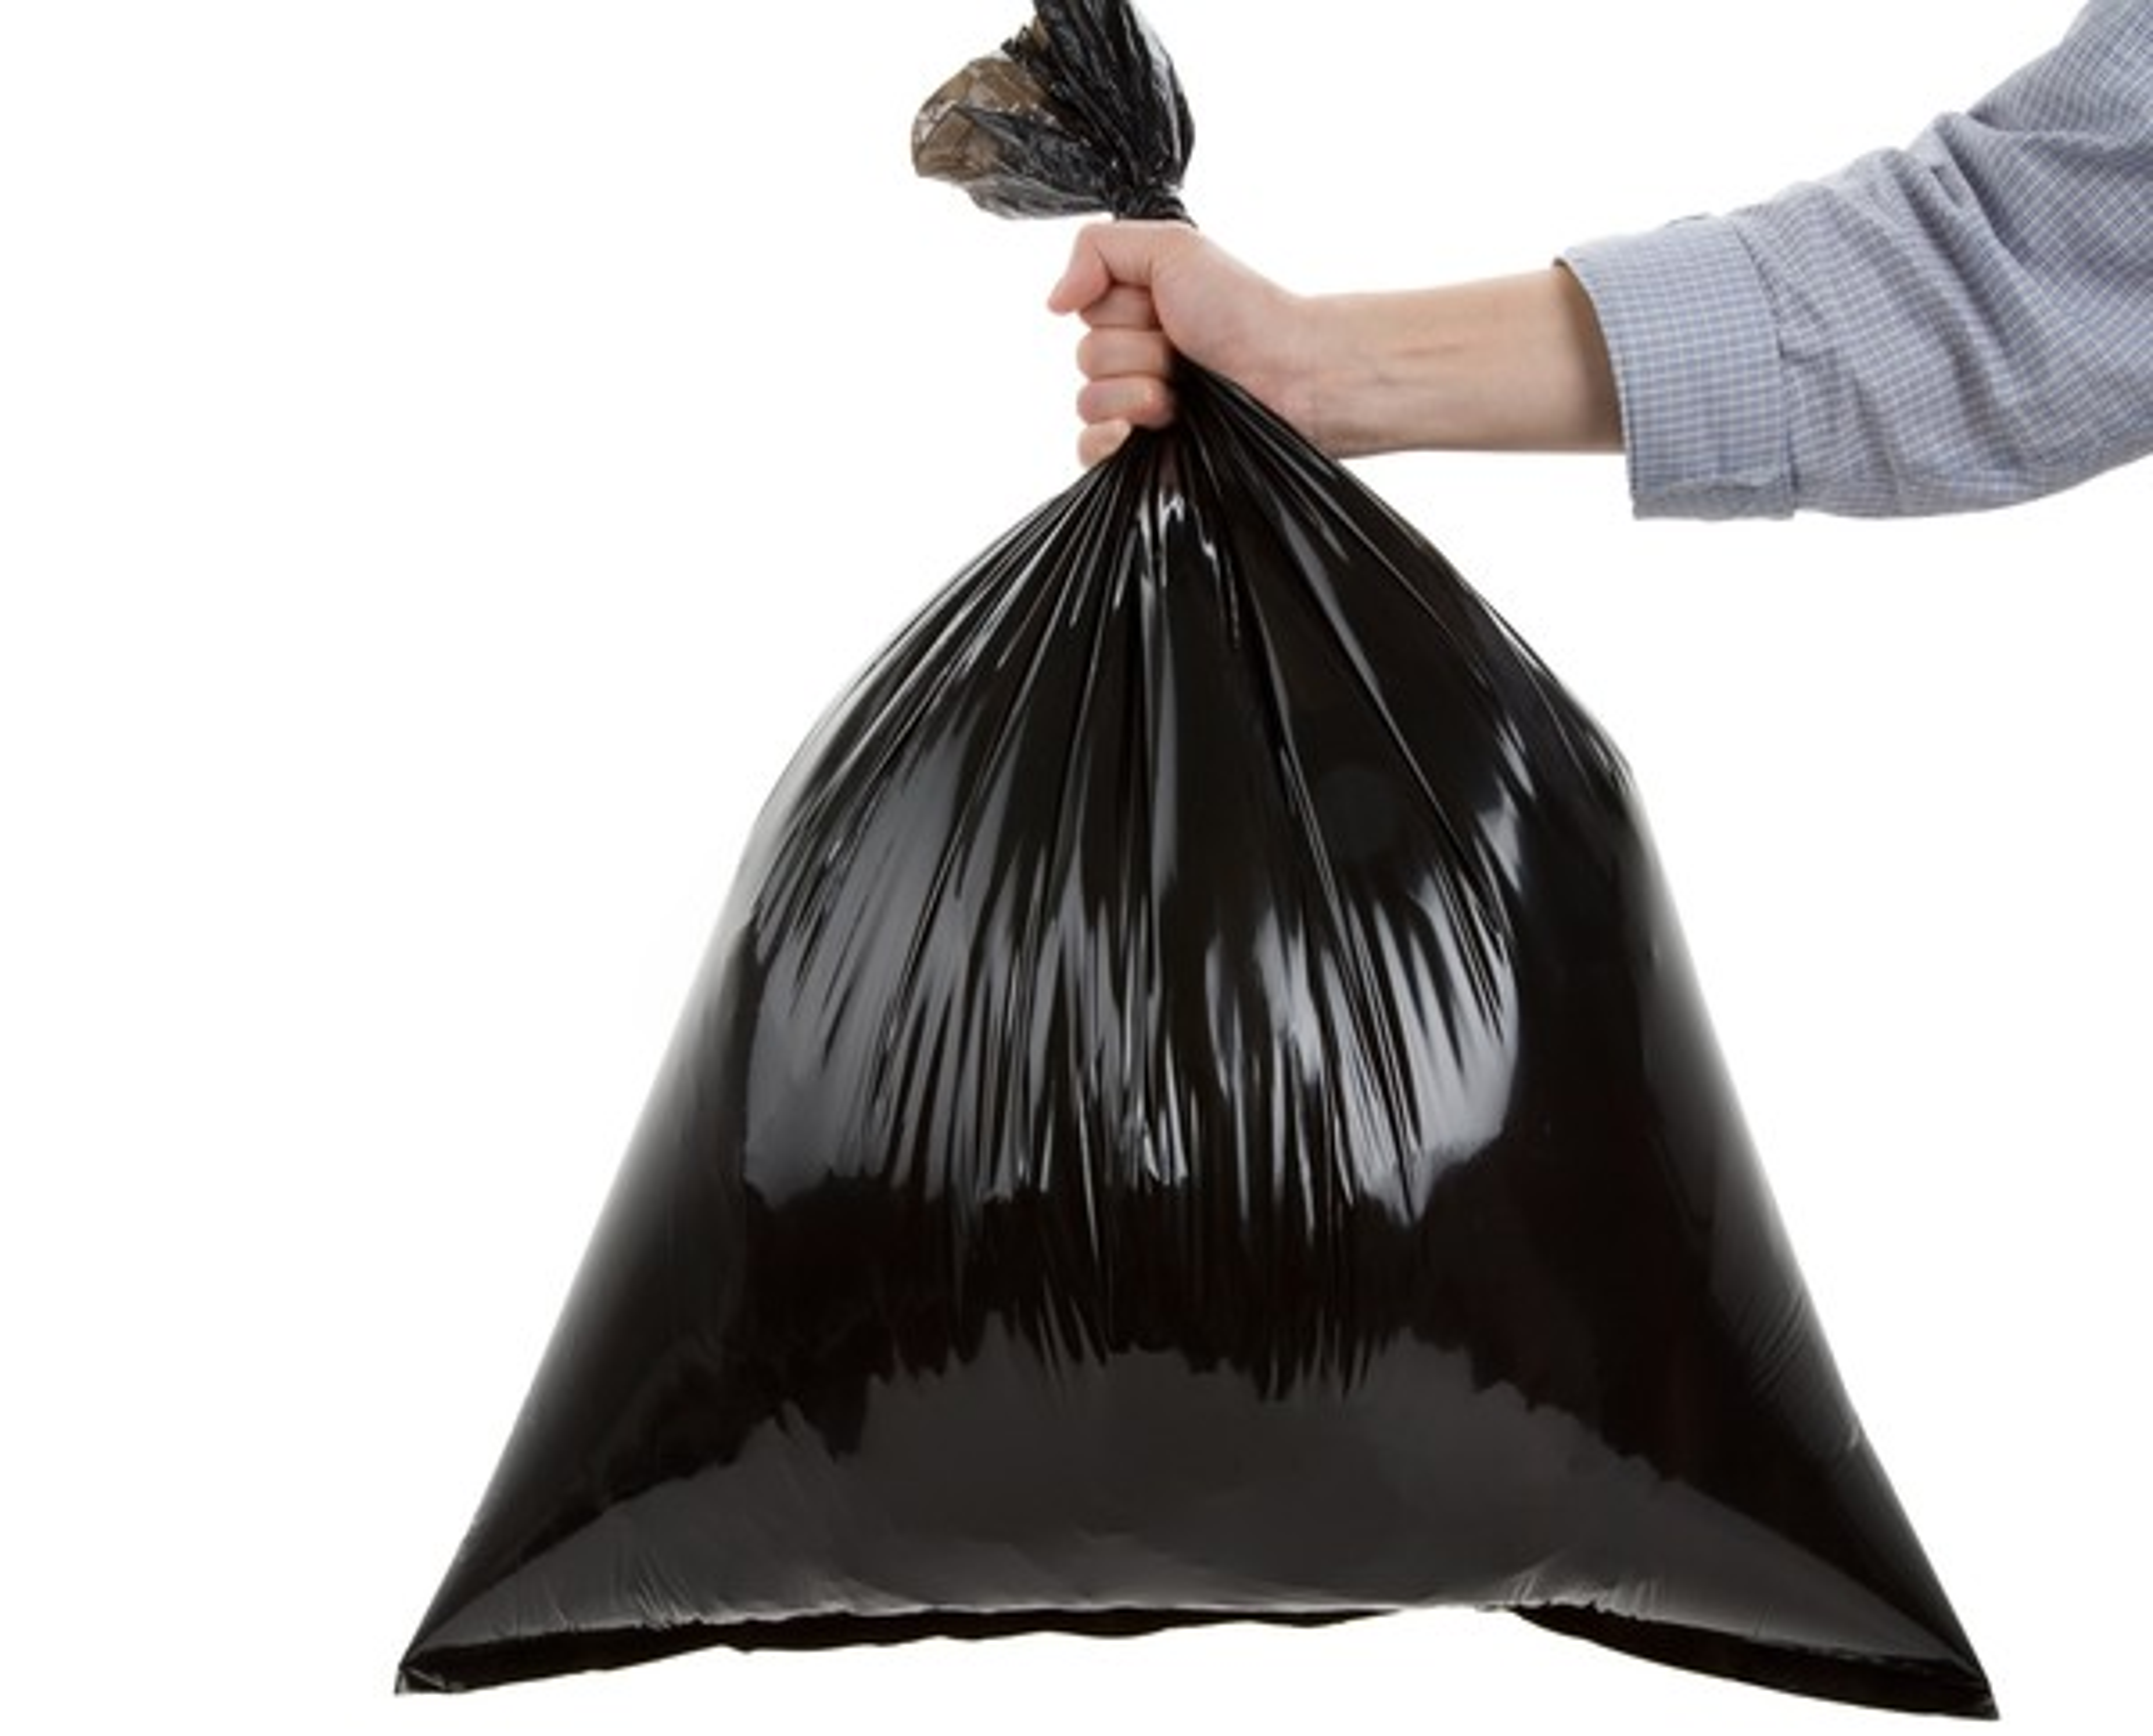 Getty Hand Holding Black Trash Bag